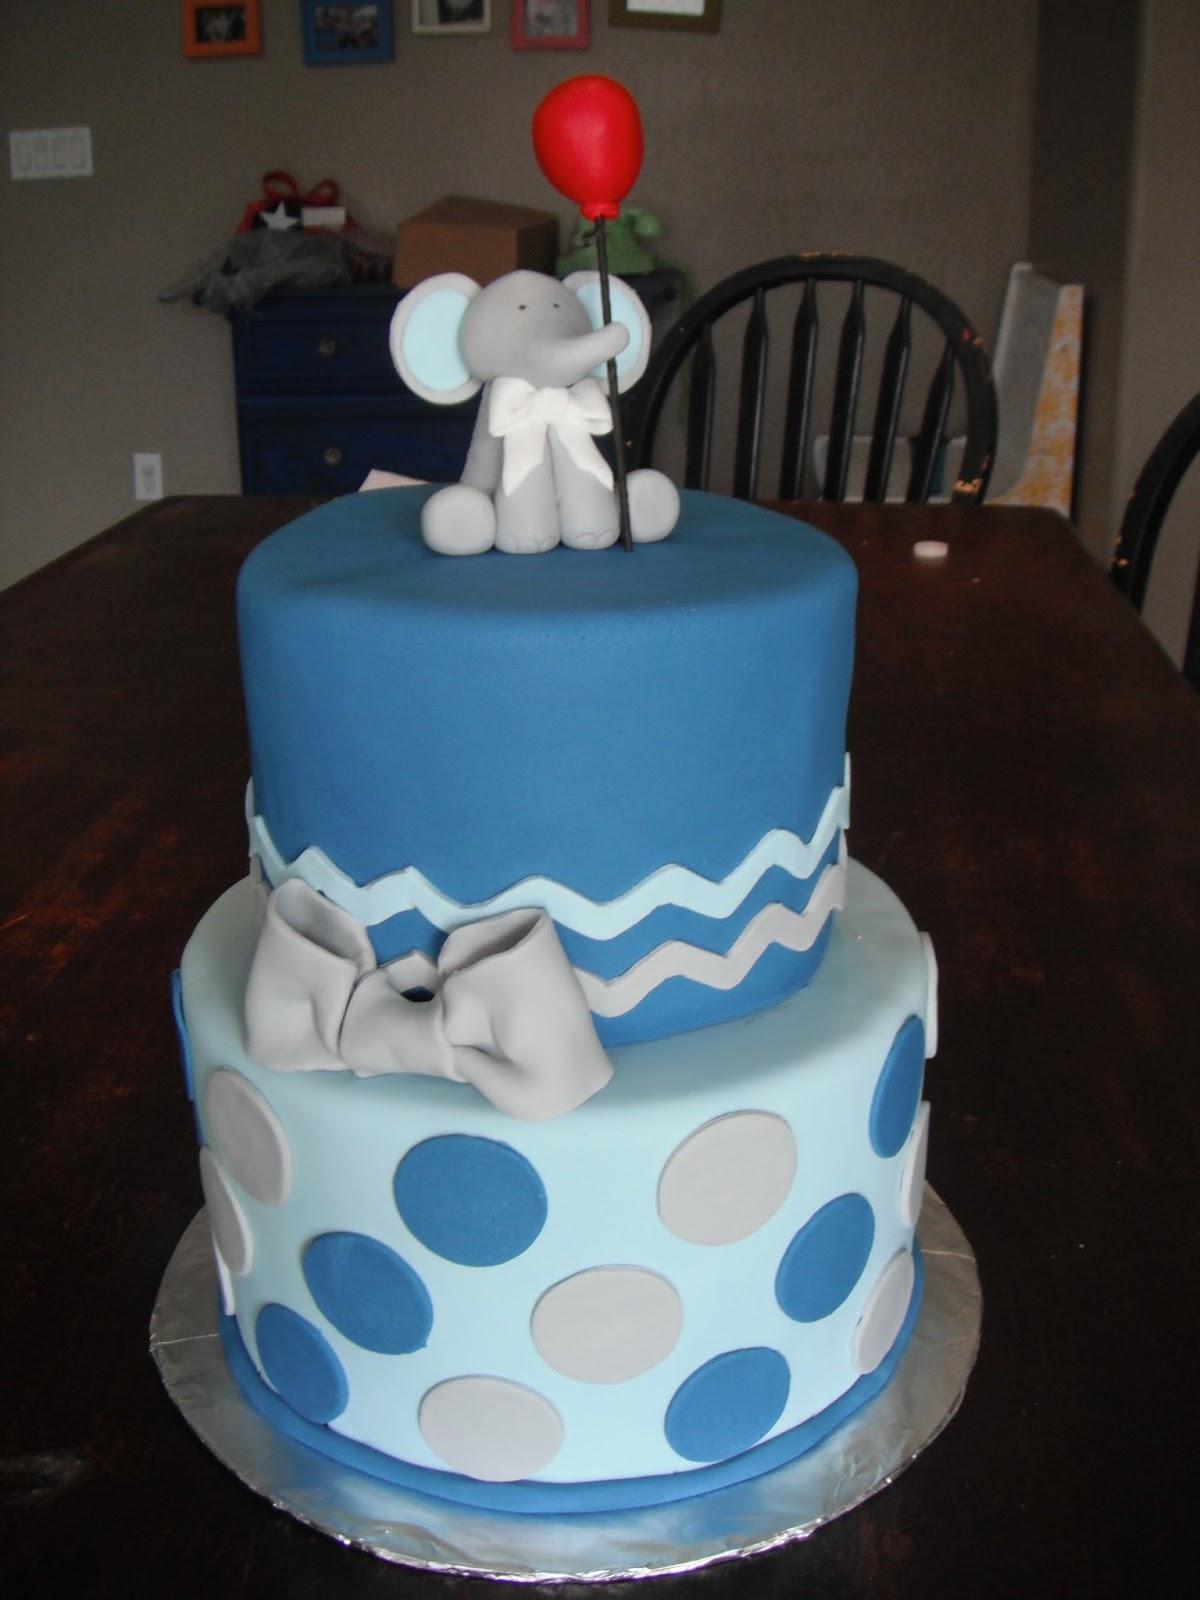 cassy 39 s cakes elephant baby shower cake